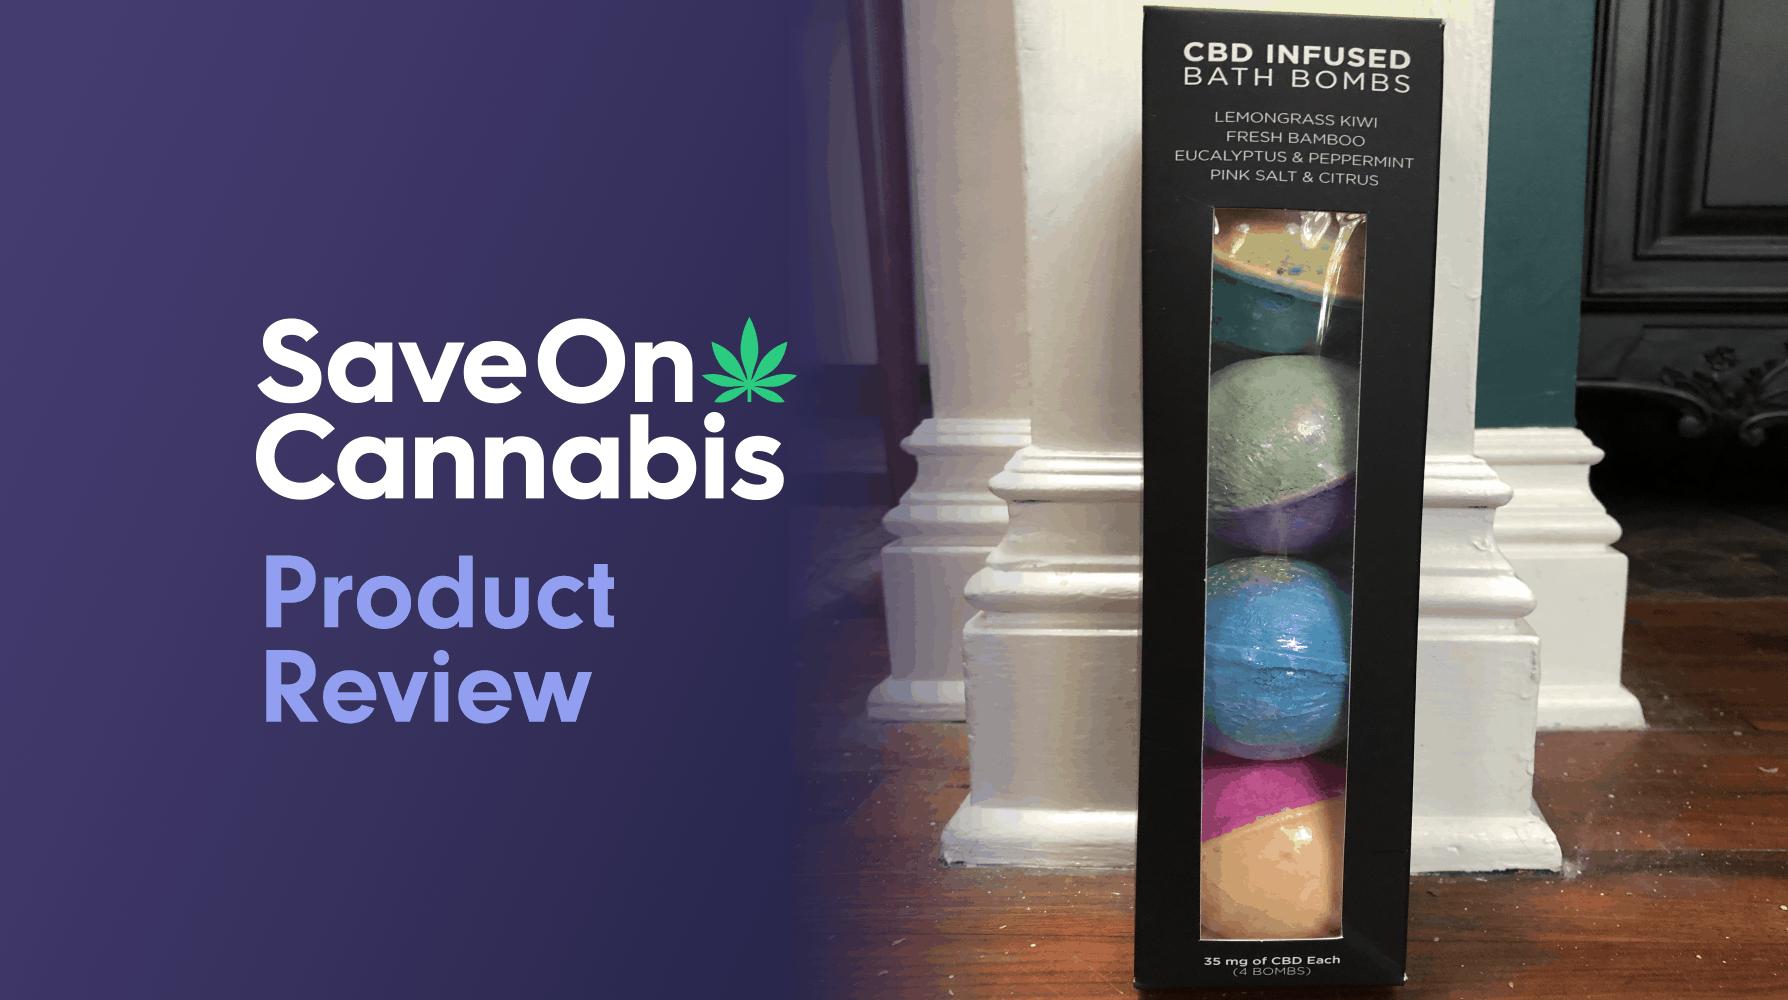 cbd for life lemongrass kiwi bath bomb review save on cannabis website